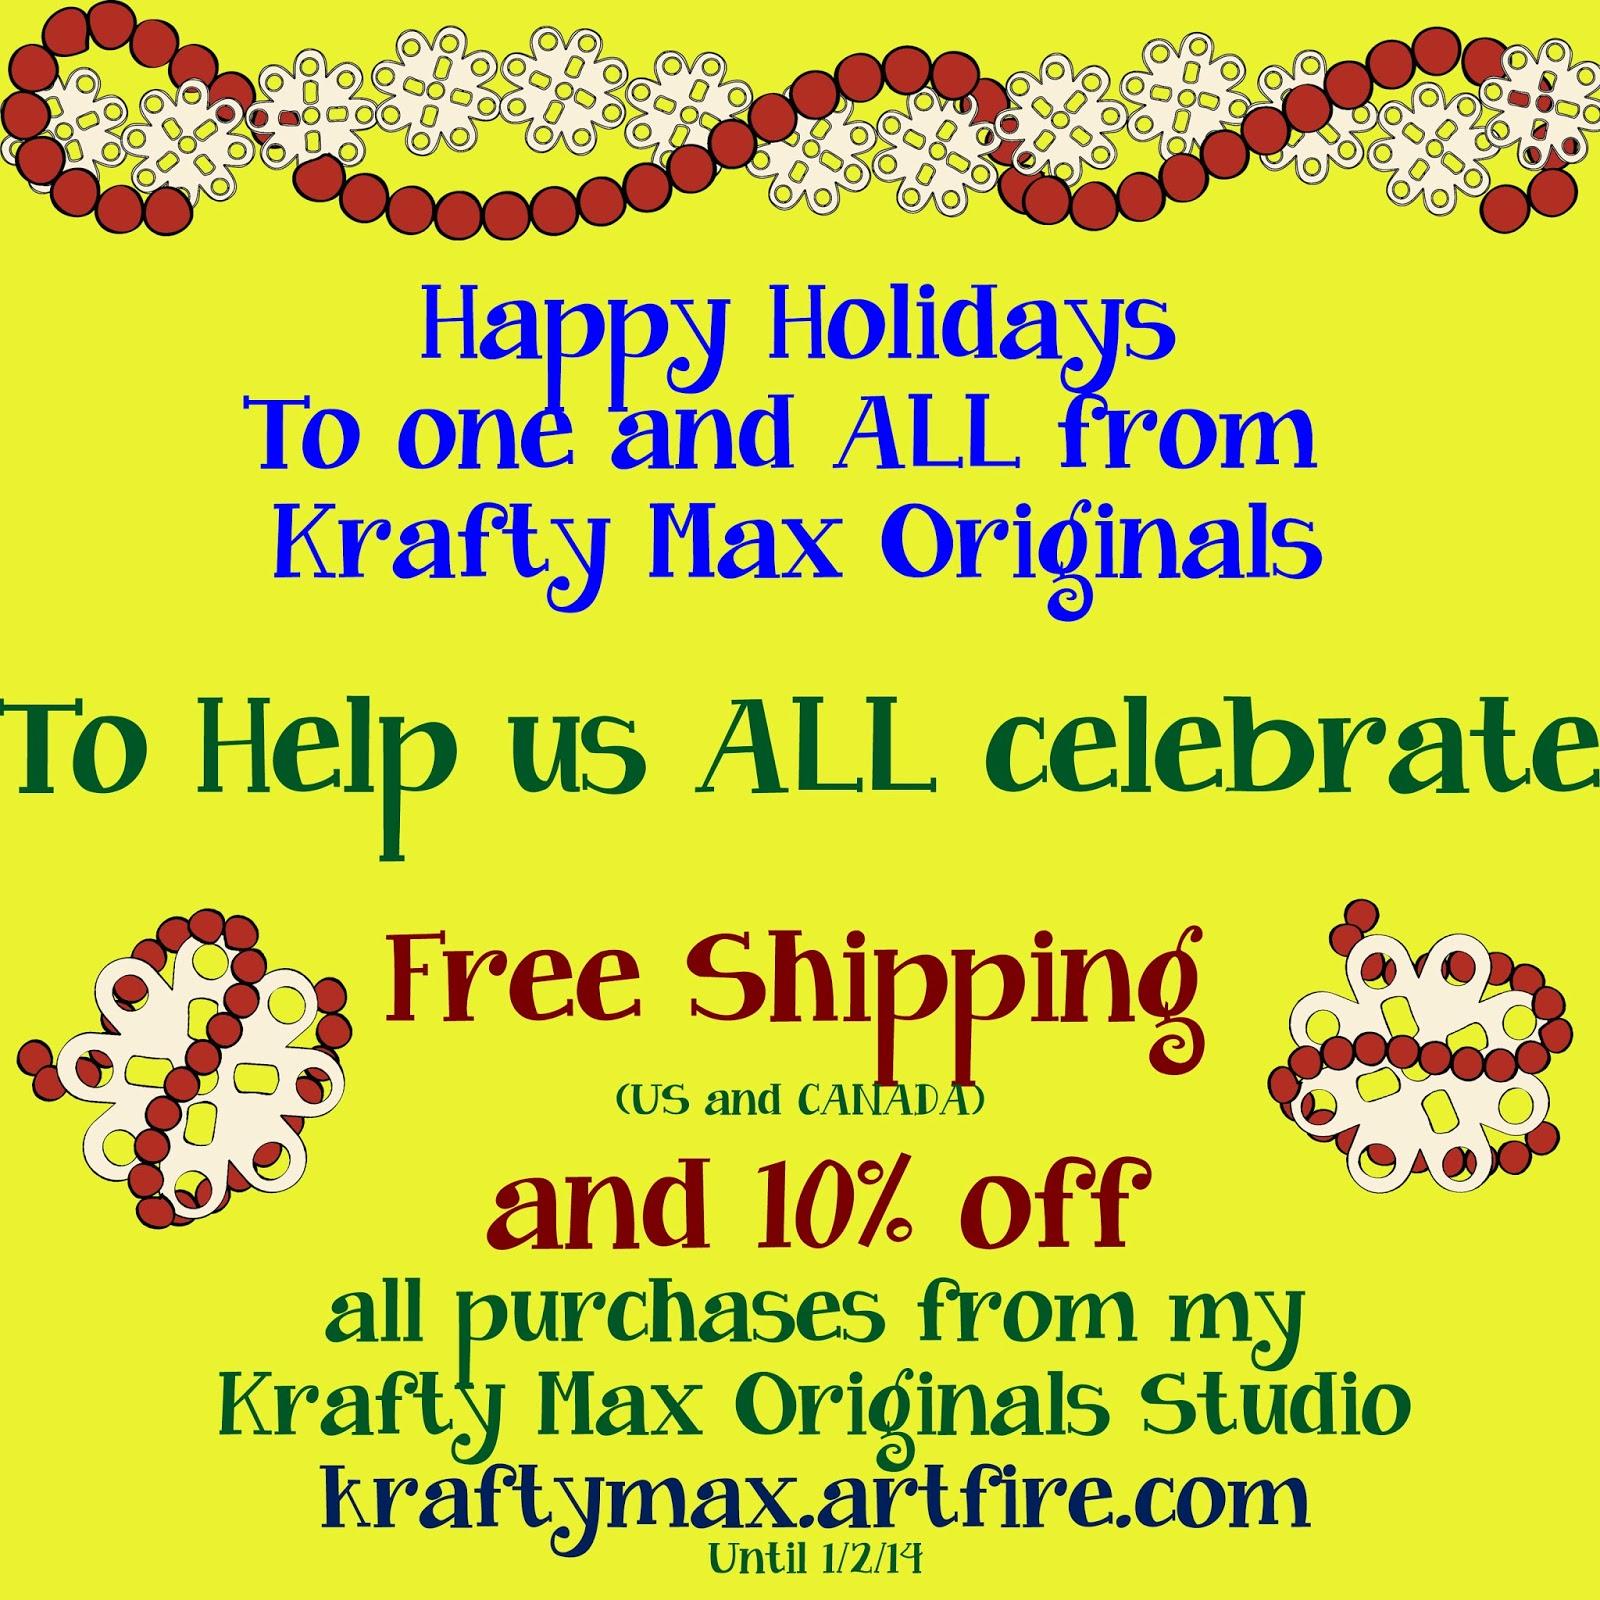 http://www.artfire.com/ext/shop/studio/KraftyMax